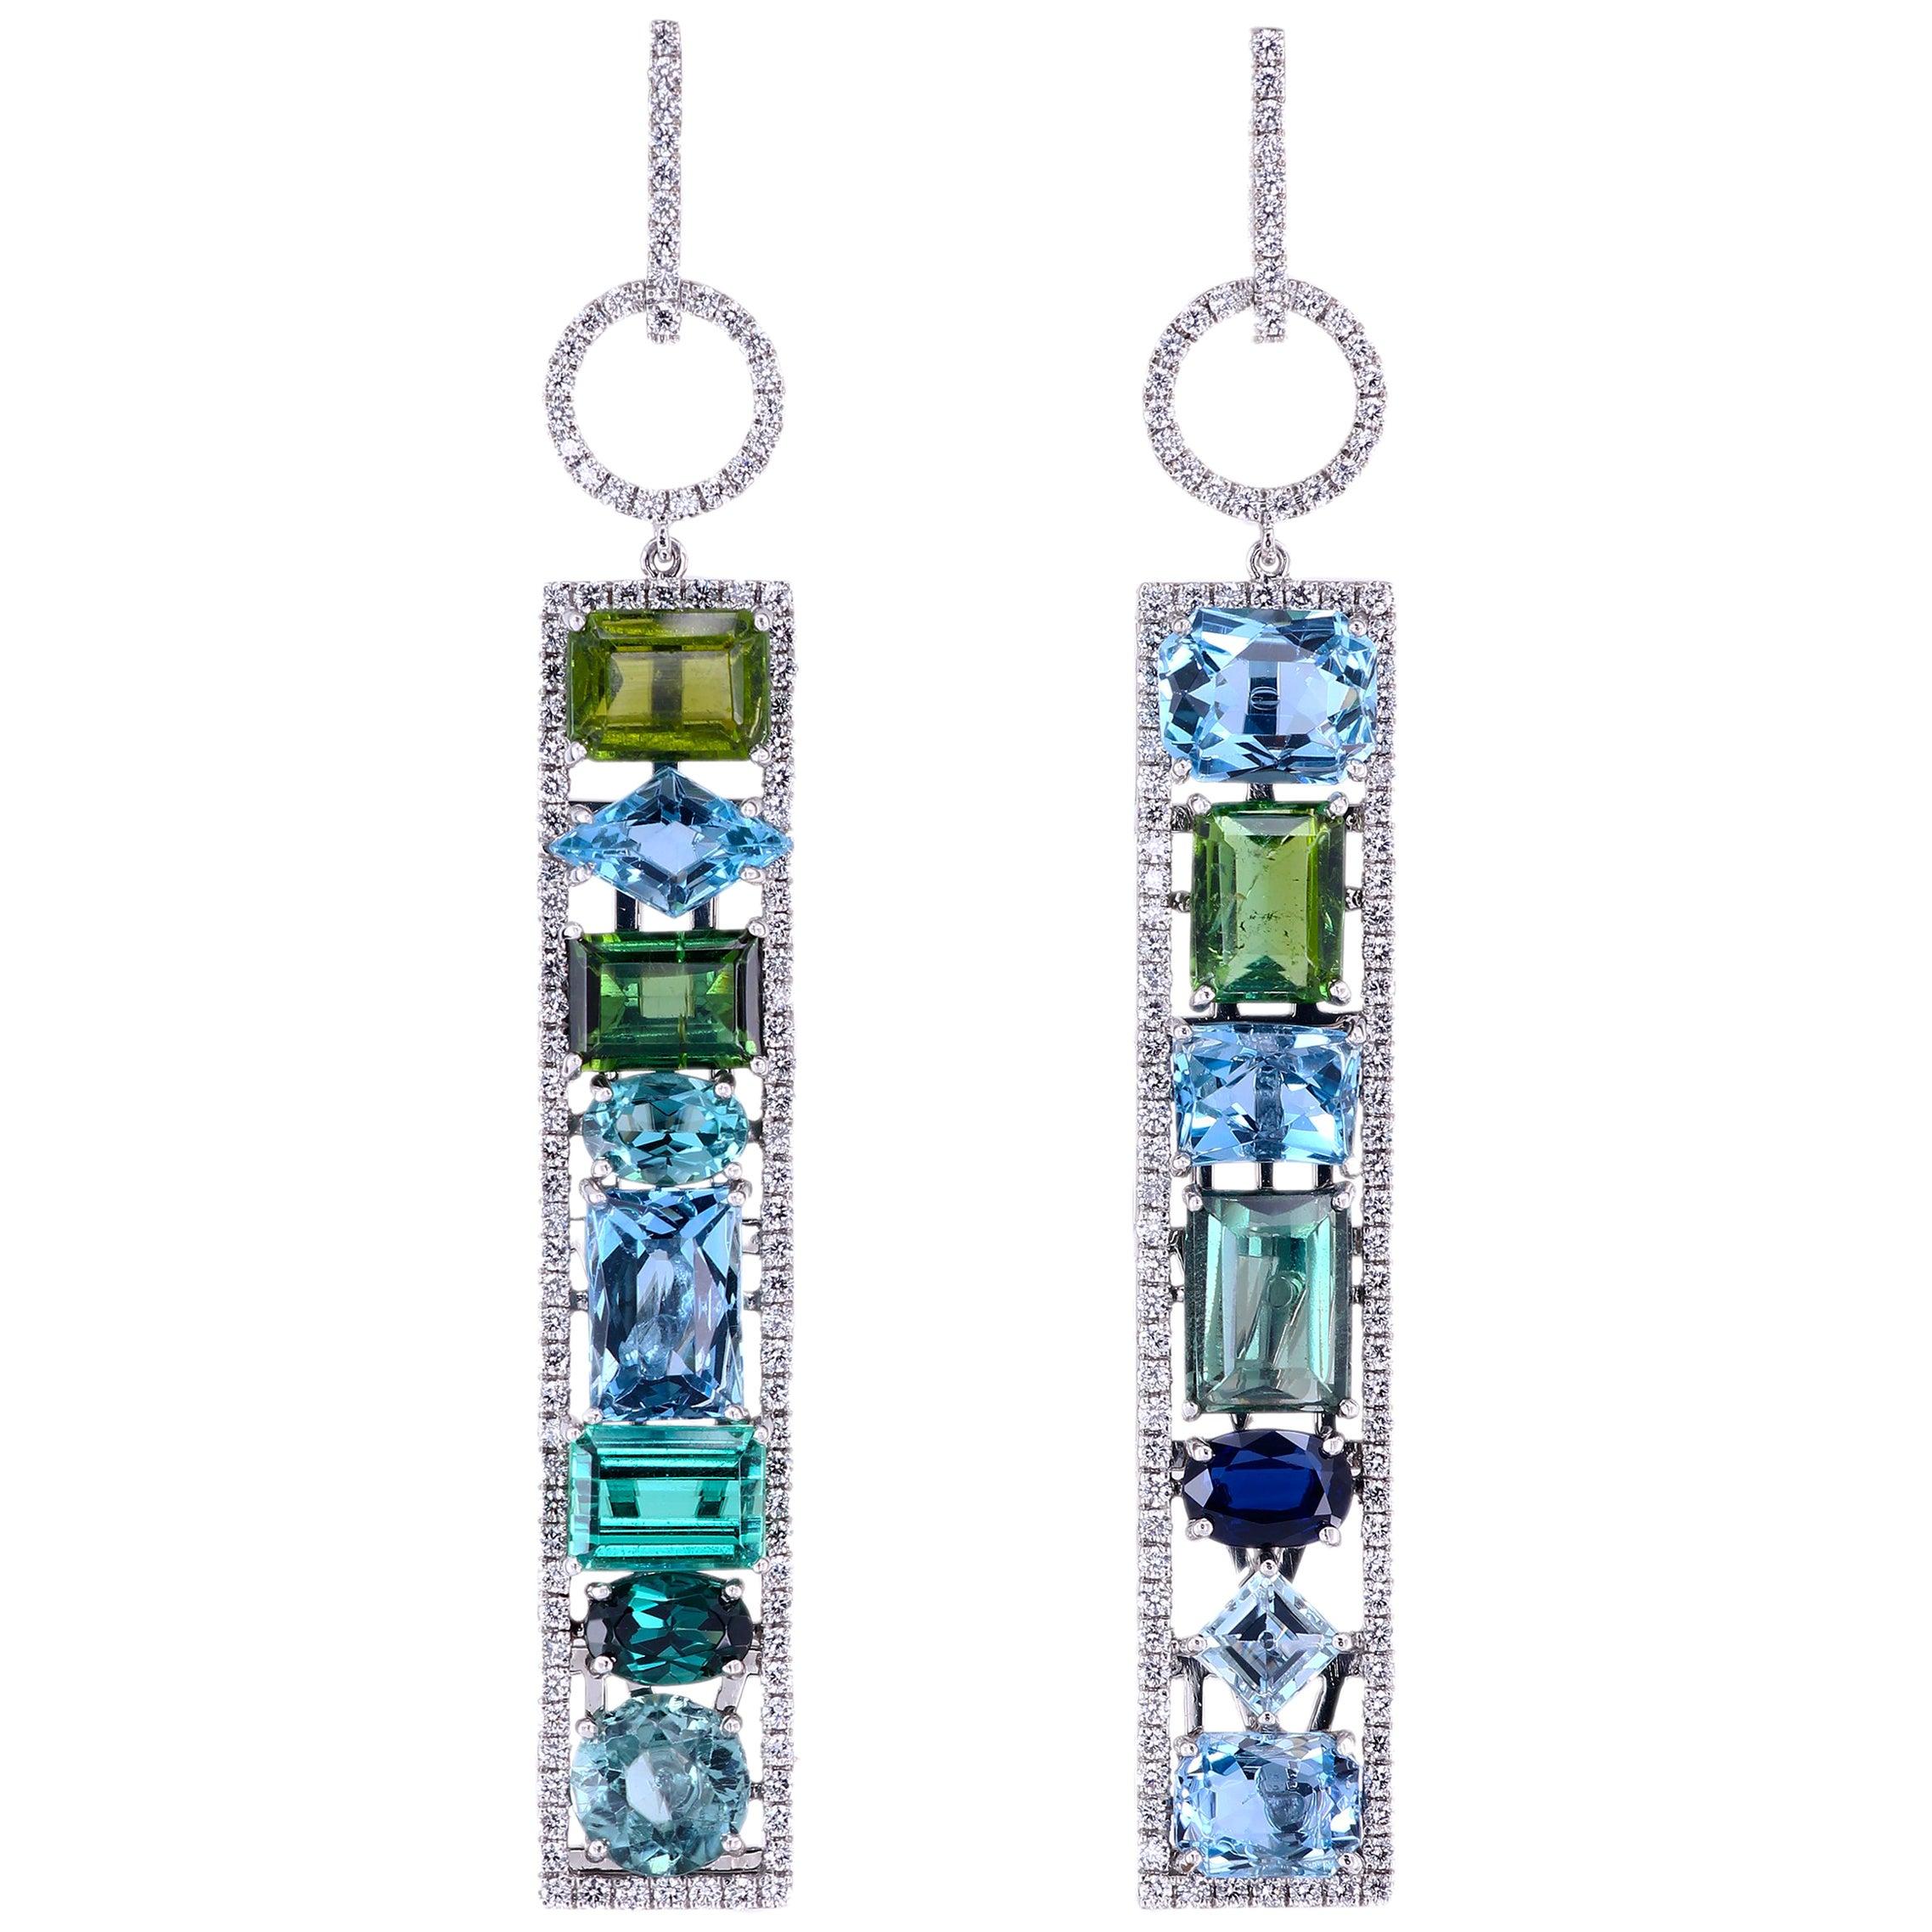 Leon Mege Couture Tourmaline Aquamarine Sapphire Diamond Earrings